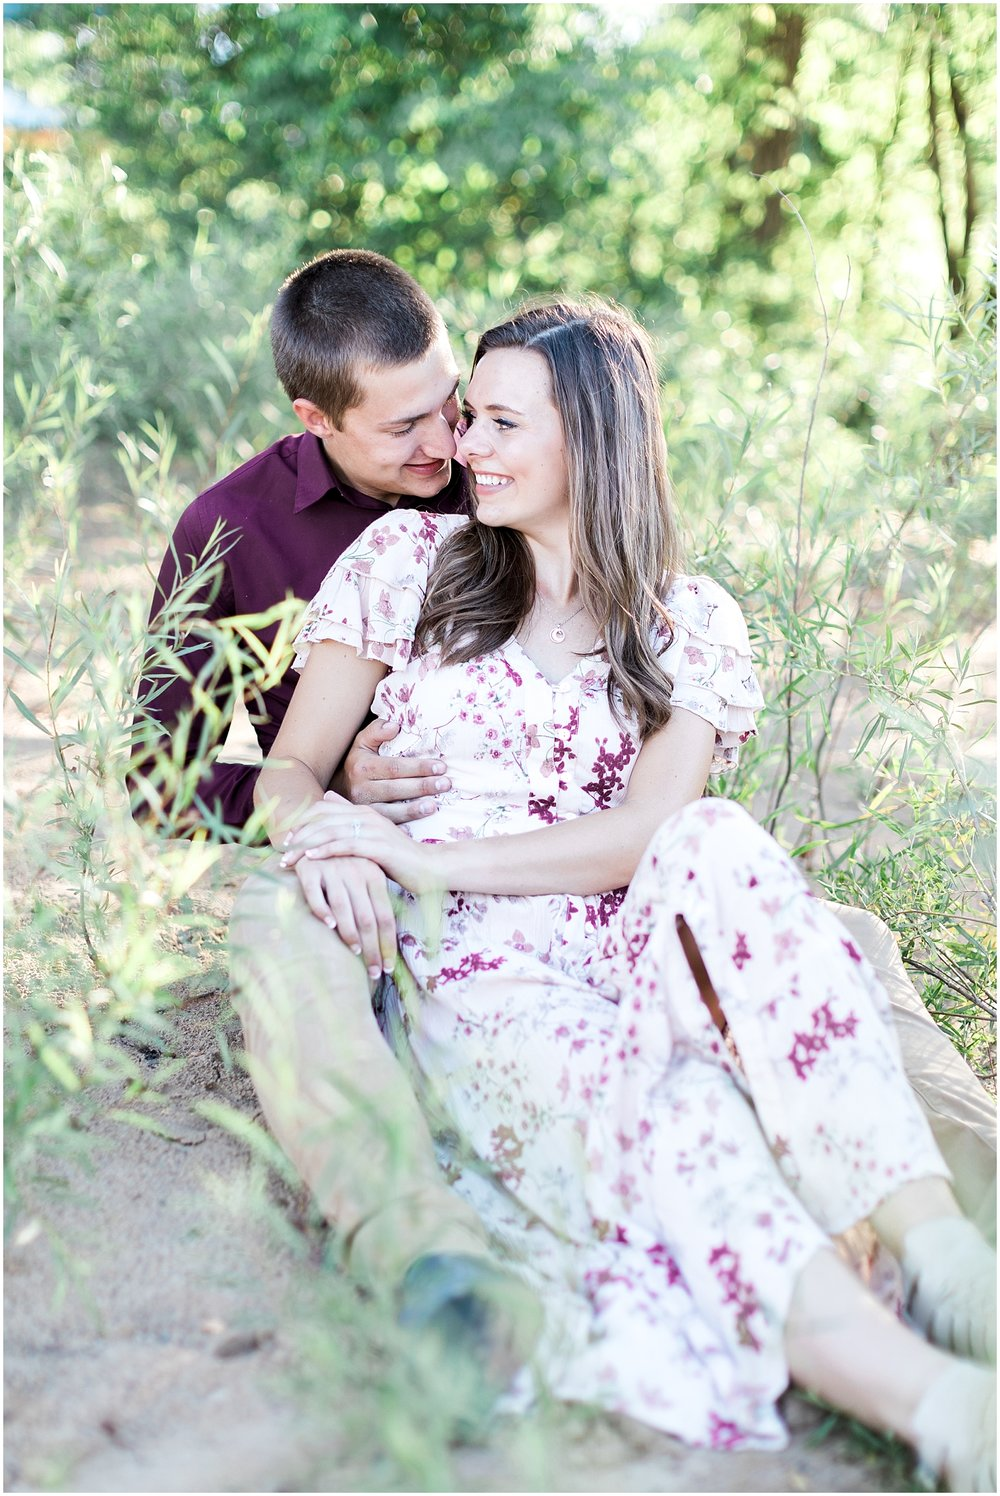 Massachusetts wedding photographer Alyssa Parker Photography